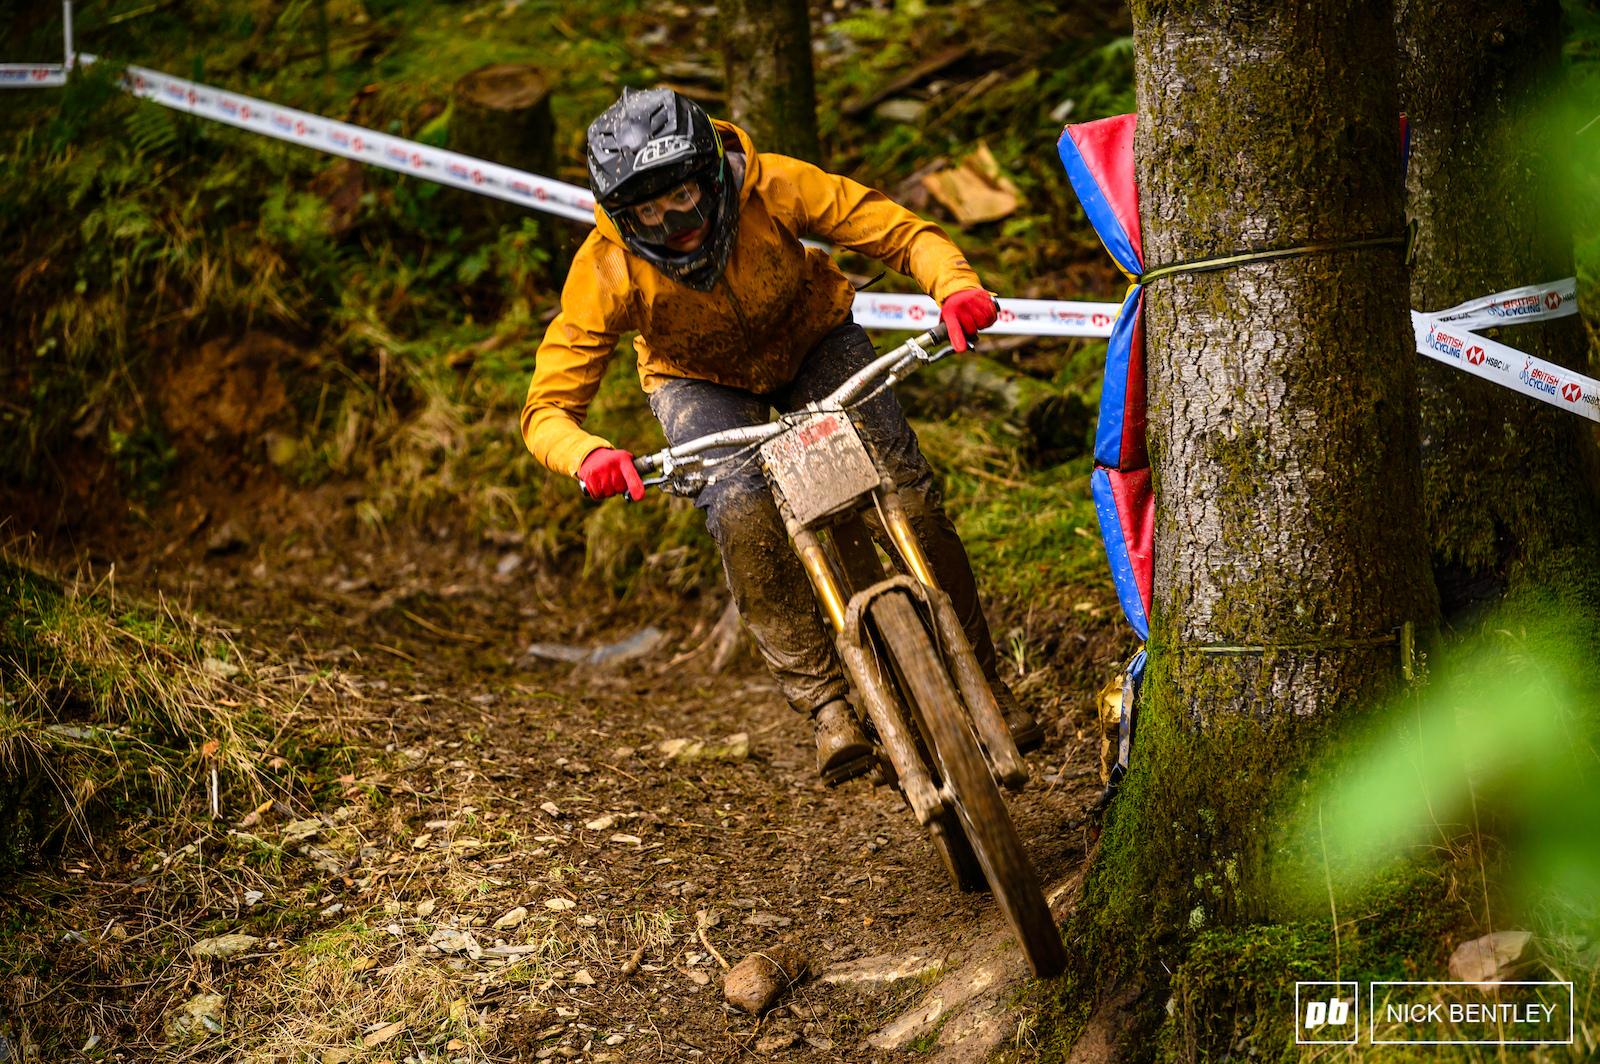 Alison Tutt having fun in the mud